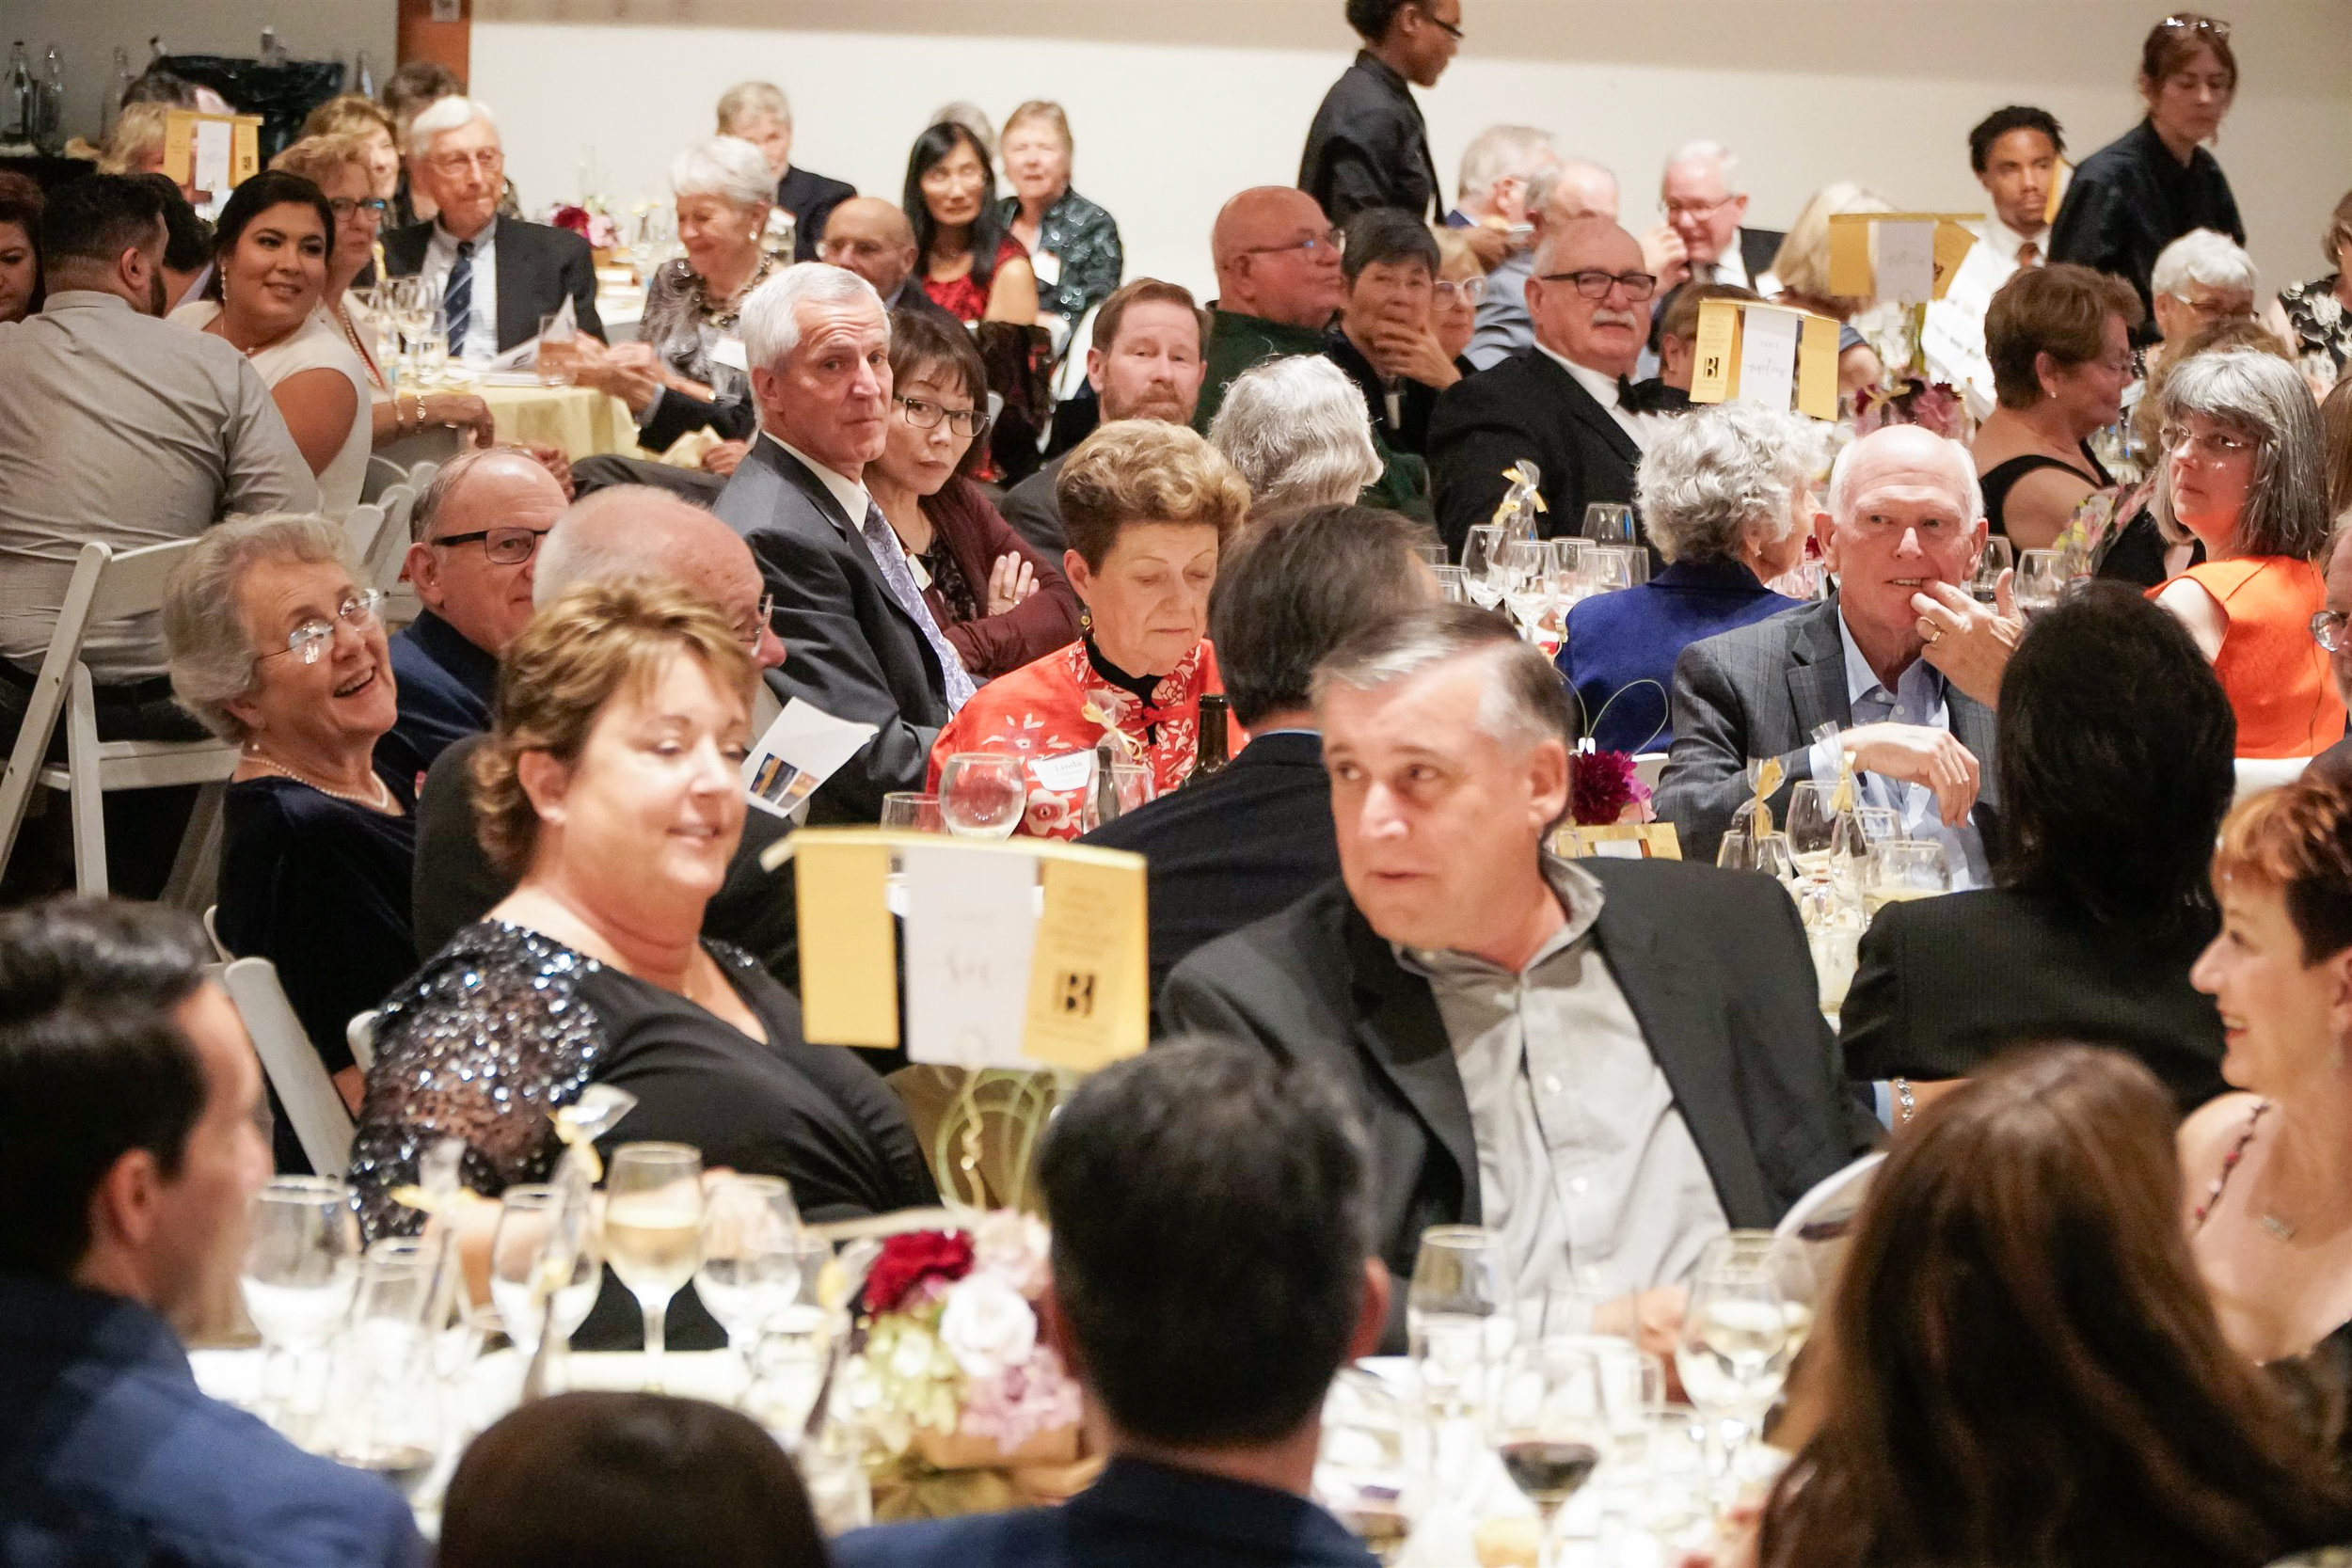 Steve and Nancy Mandic among guests.